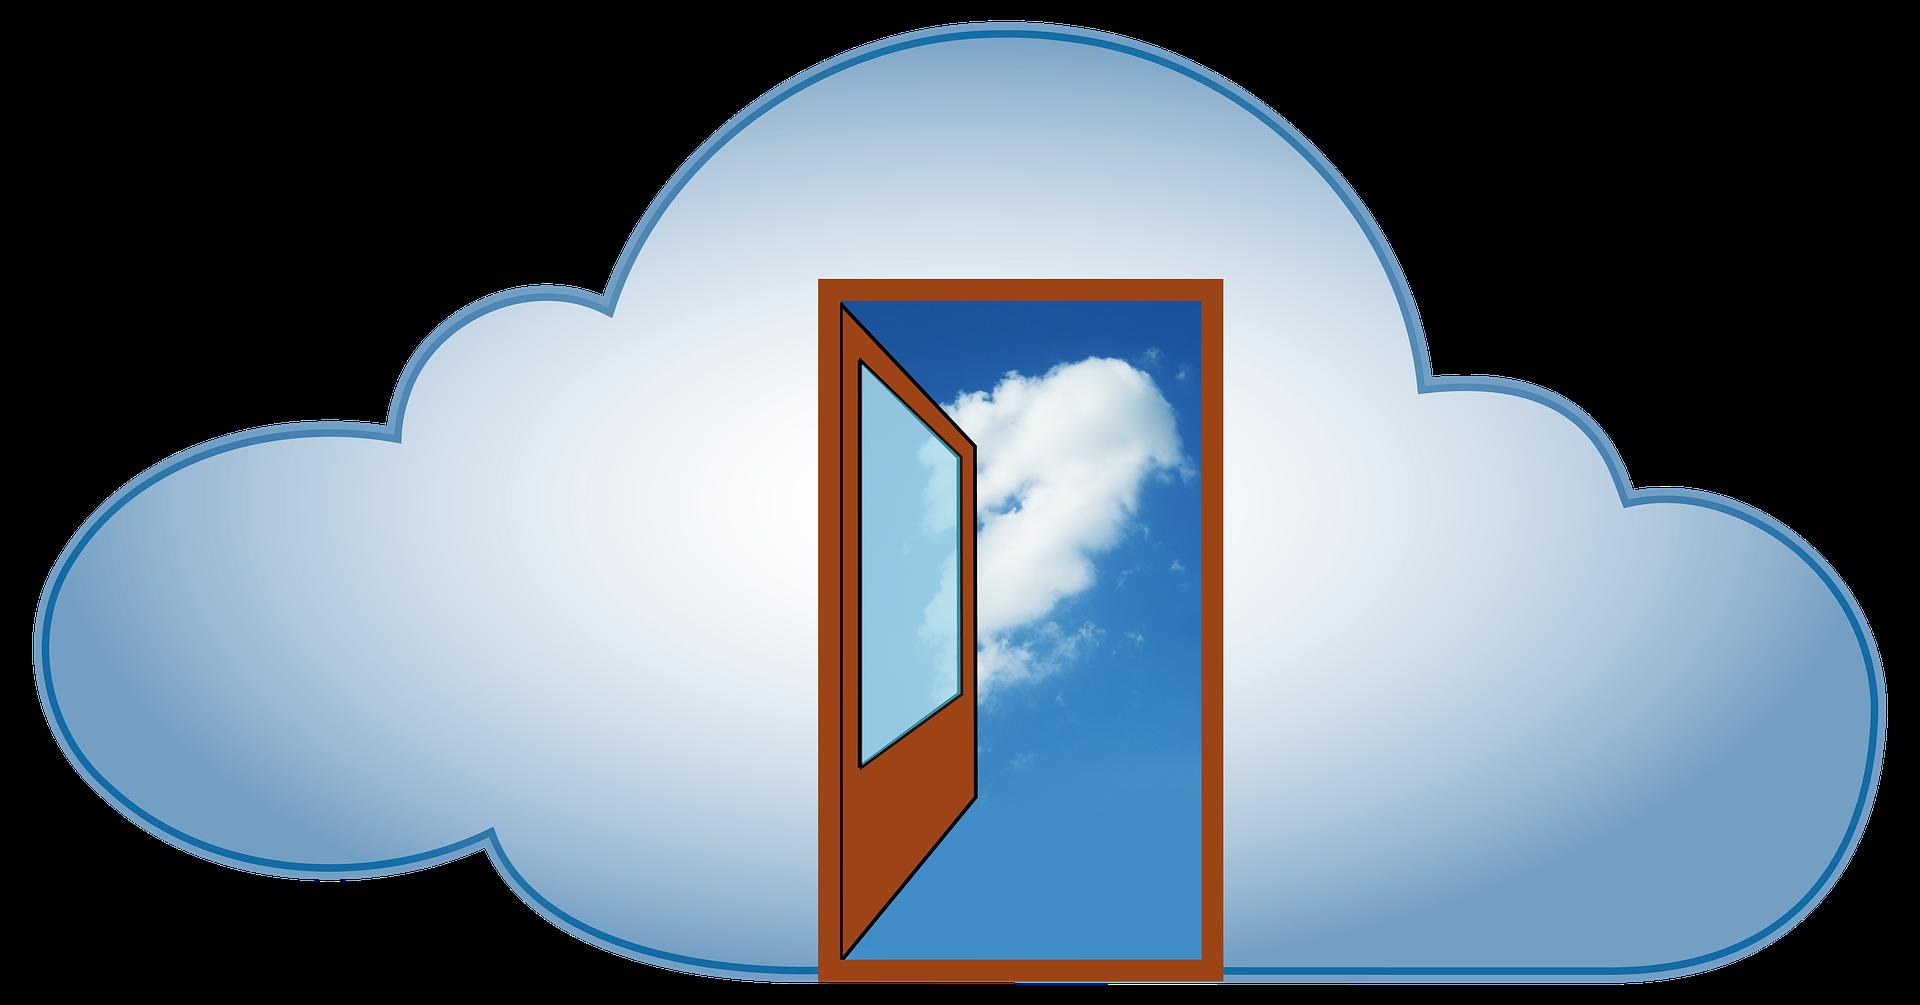 cloud-computing-626252_1920.png